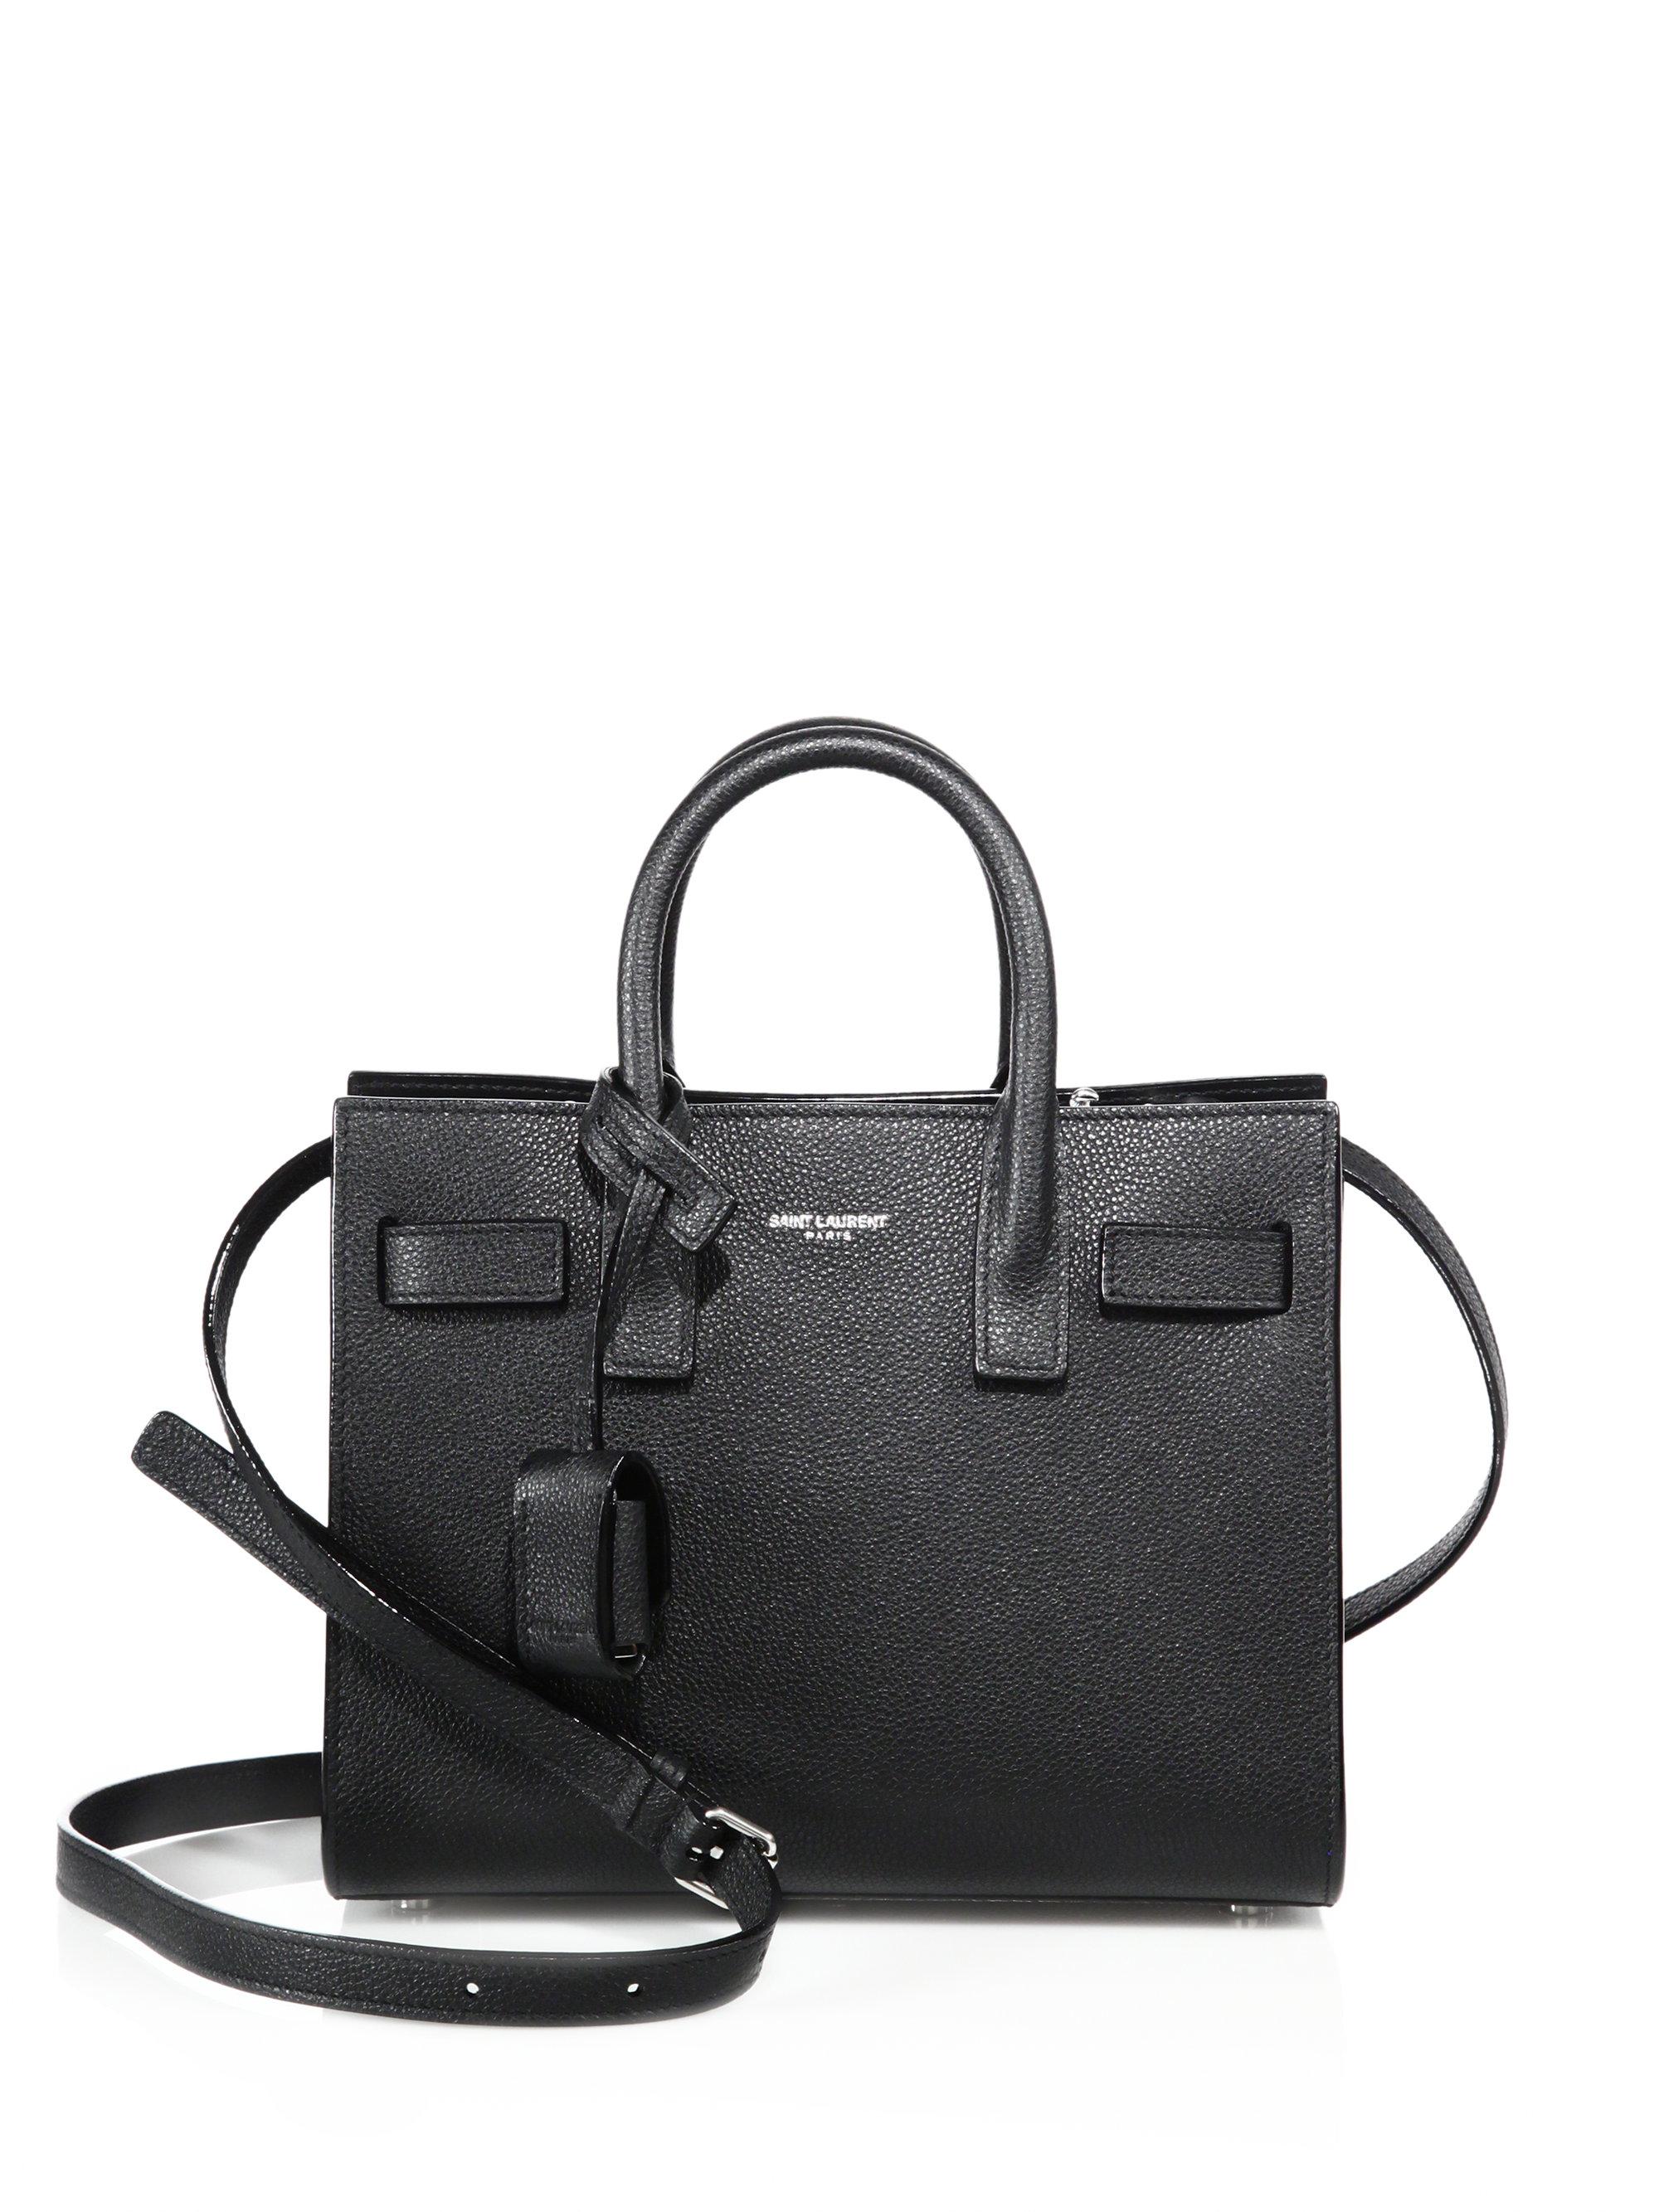 ysl classic bags - Saint laurent Sac De Jour Nano Grained Leather Tote in Black | Lyst